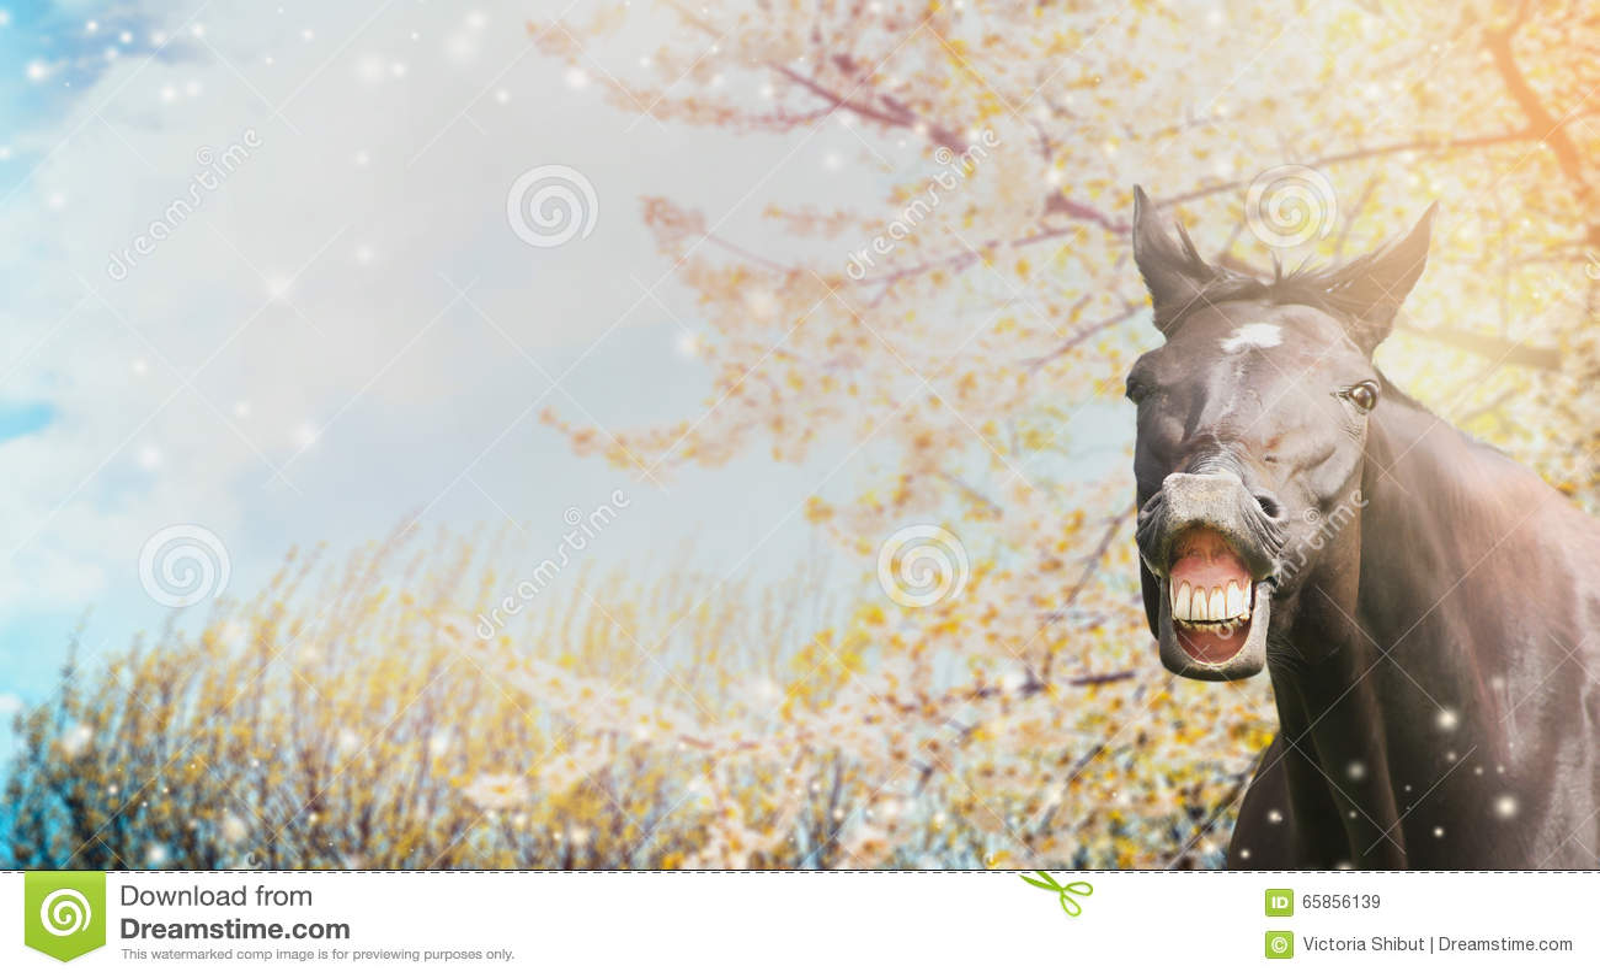 Stående av en häst med ett leende på bakgrund av vårblomningnaturen